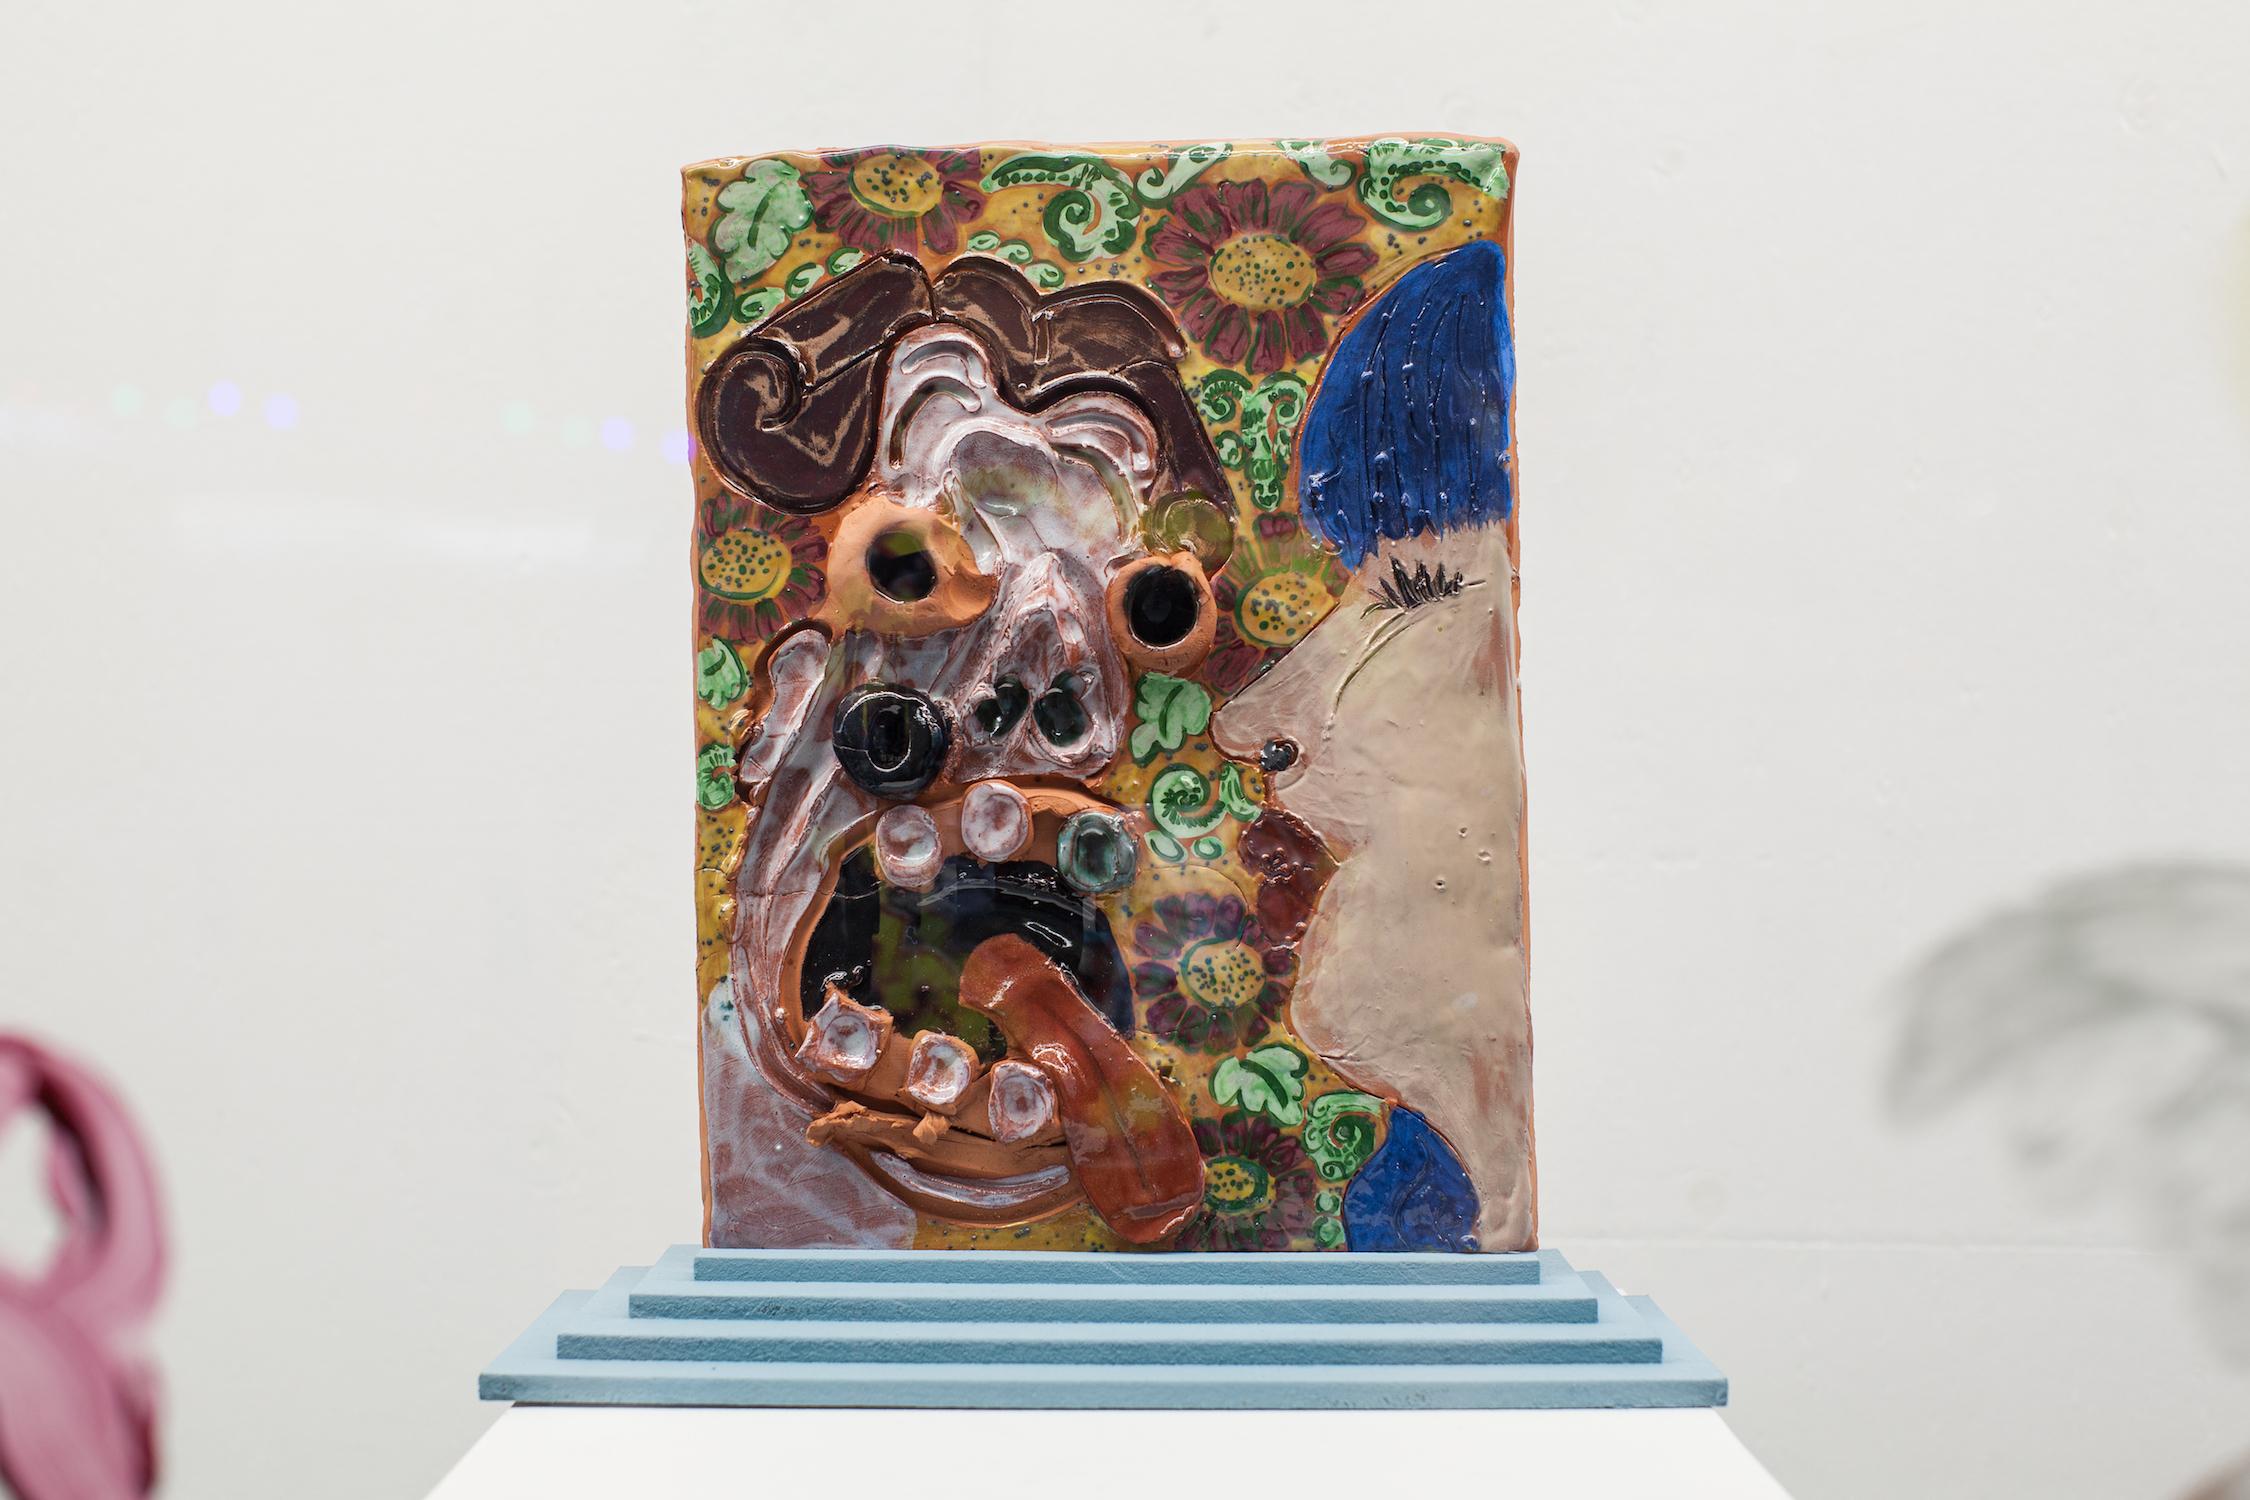 Jamie Fitzpatrick & Lindsey Mendick, Snog, 2018. Glazed ceramic, MDF, paint. 18 x 46 x 43 cm. Photographer: Nicolas Gysin.